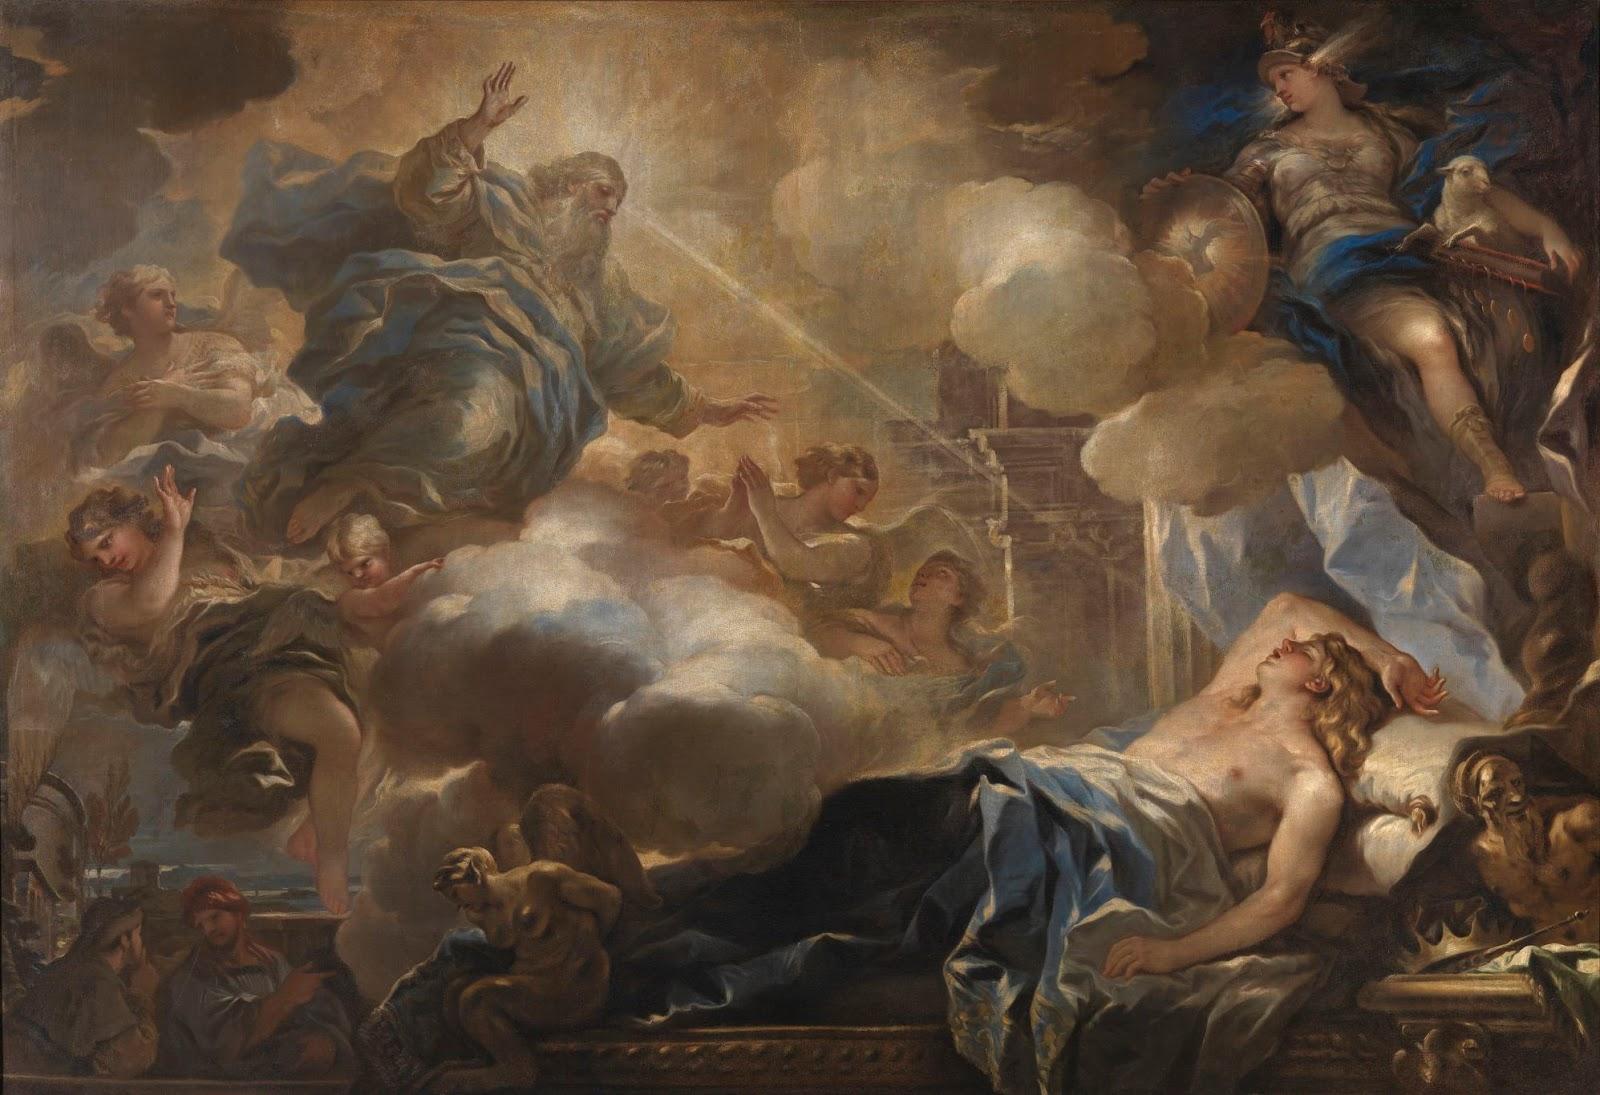 Spencer Alley European Religious Paintings At The Prado